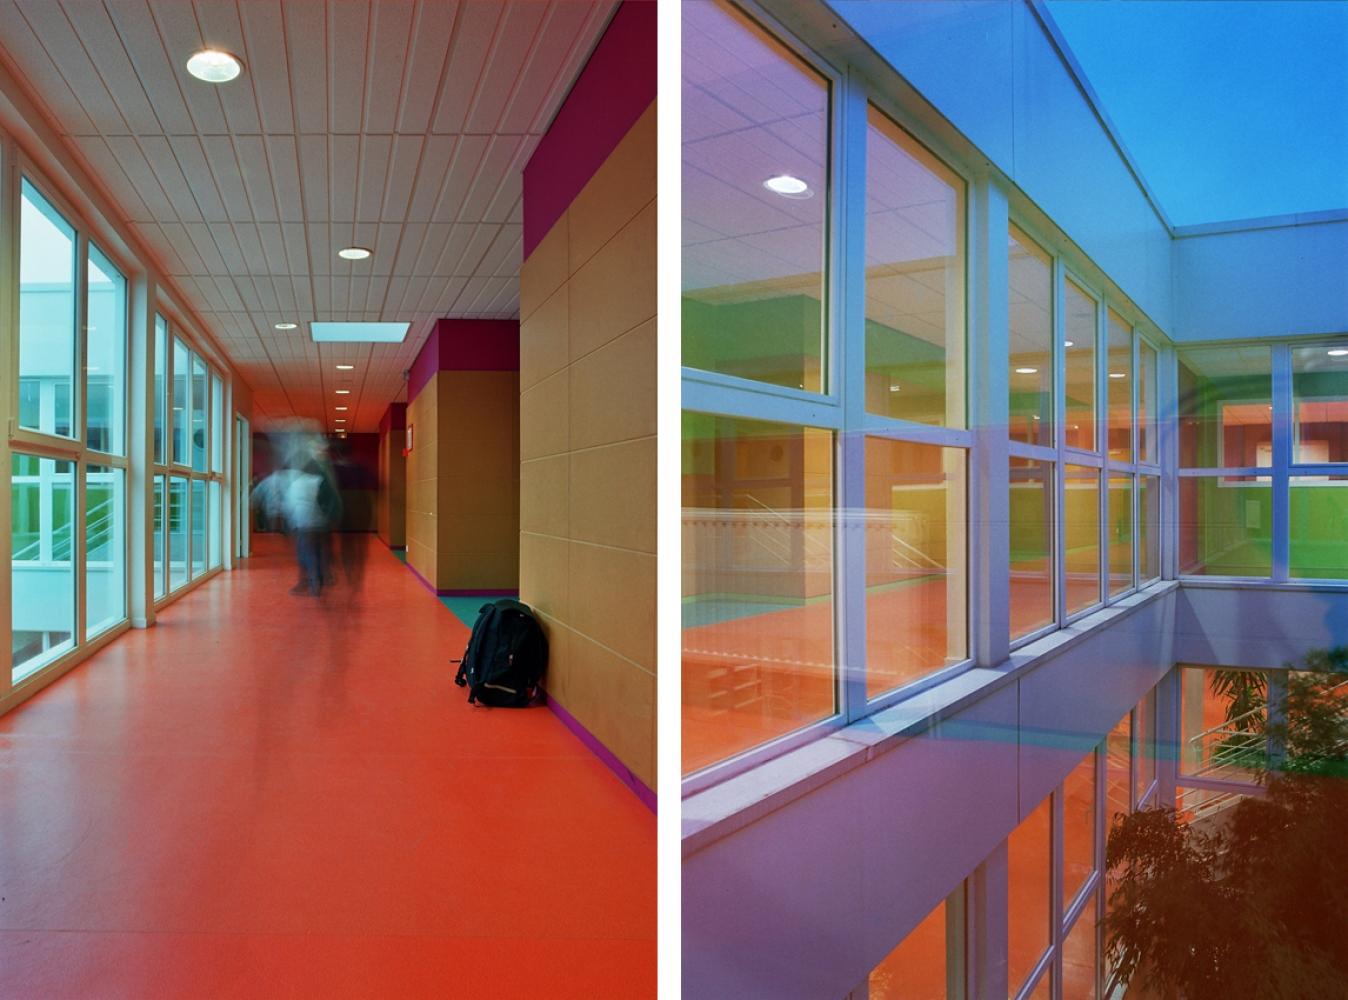 zligu---05 Pascale SEURIN Architecte - Pascale SEURIN Architecte